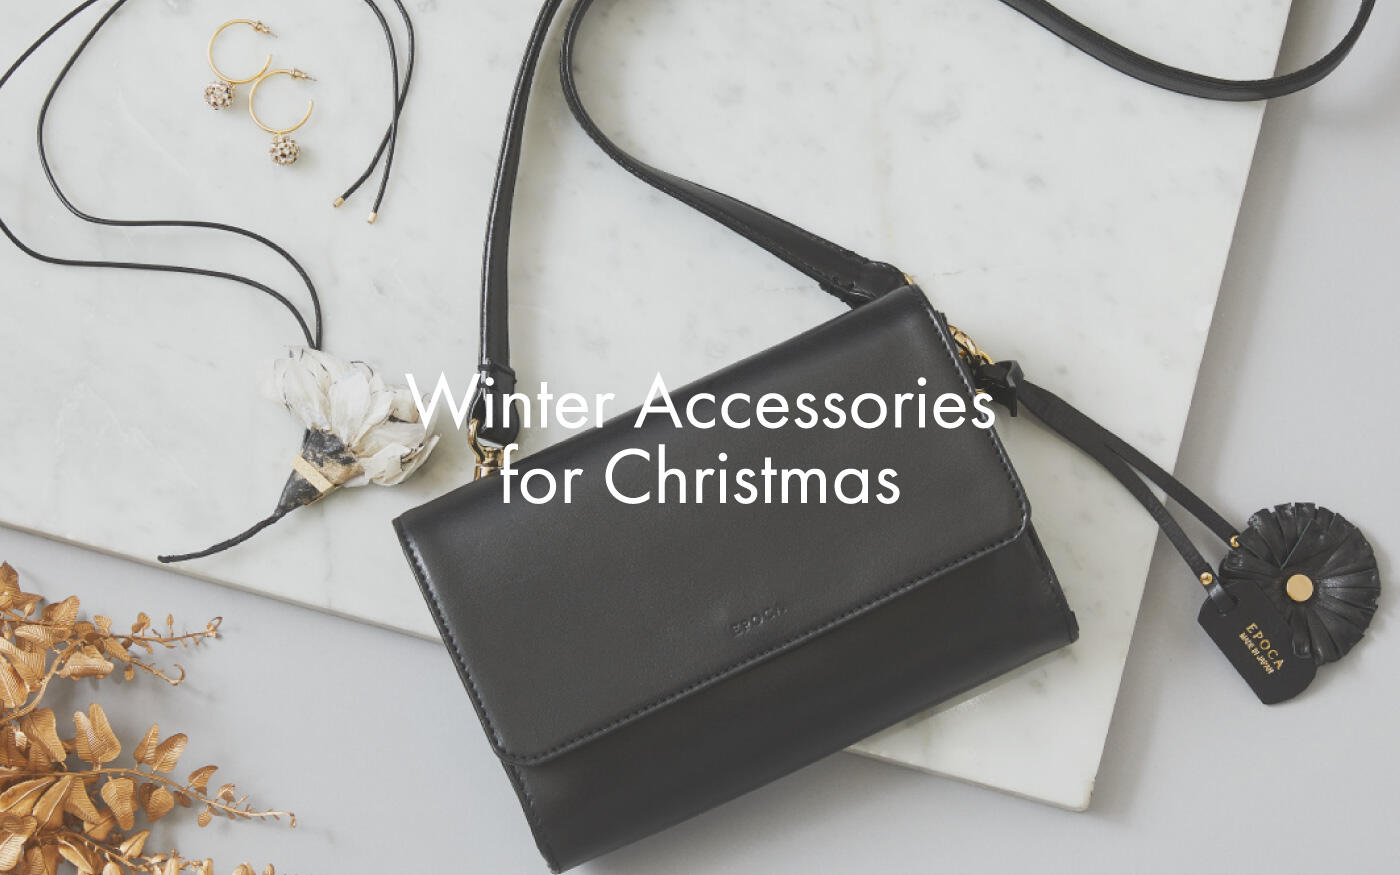 Winter Accessories for Christmas | 特別な日に身に付けたい、心華やぐ厳選アクセサリー